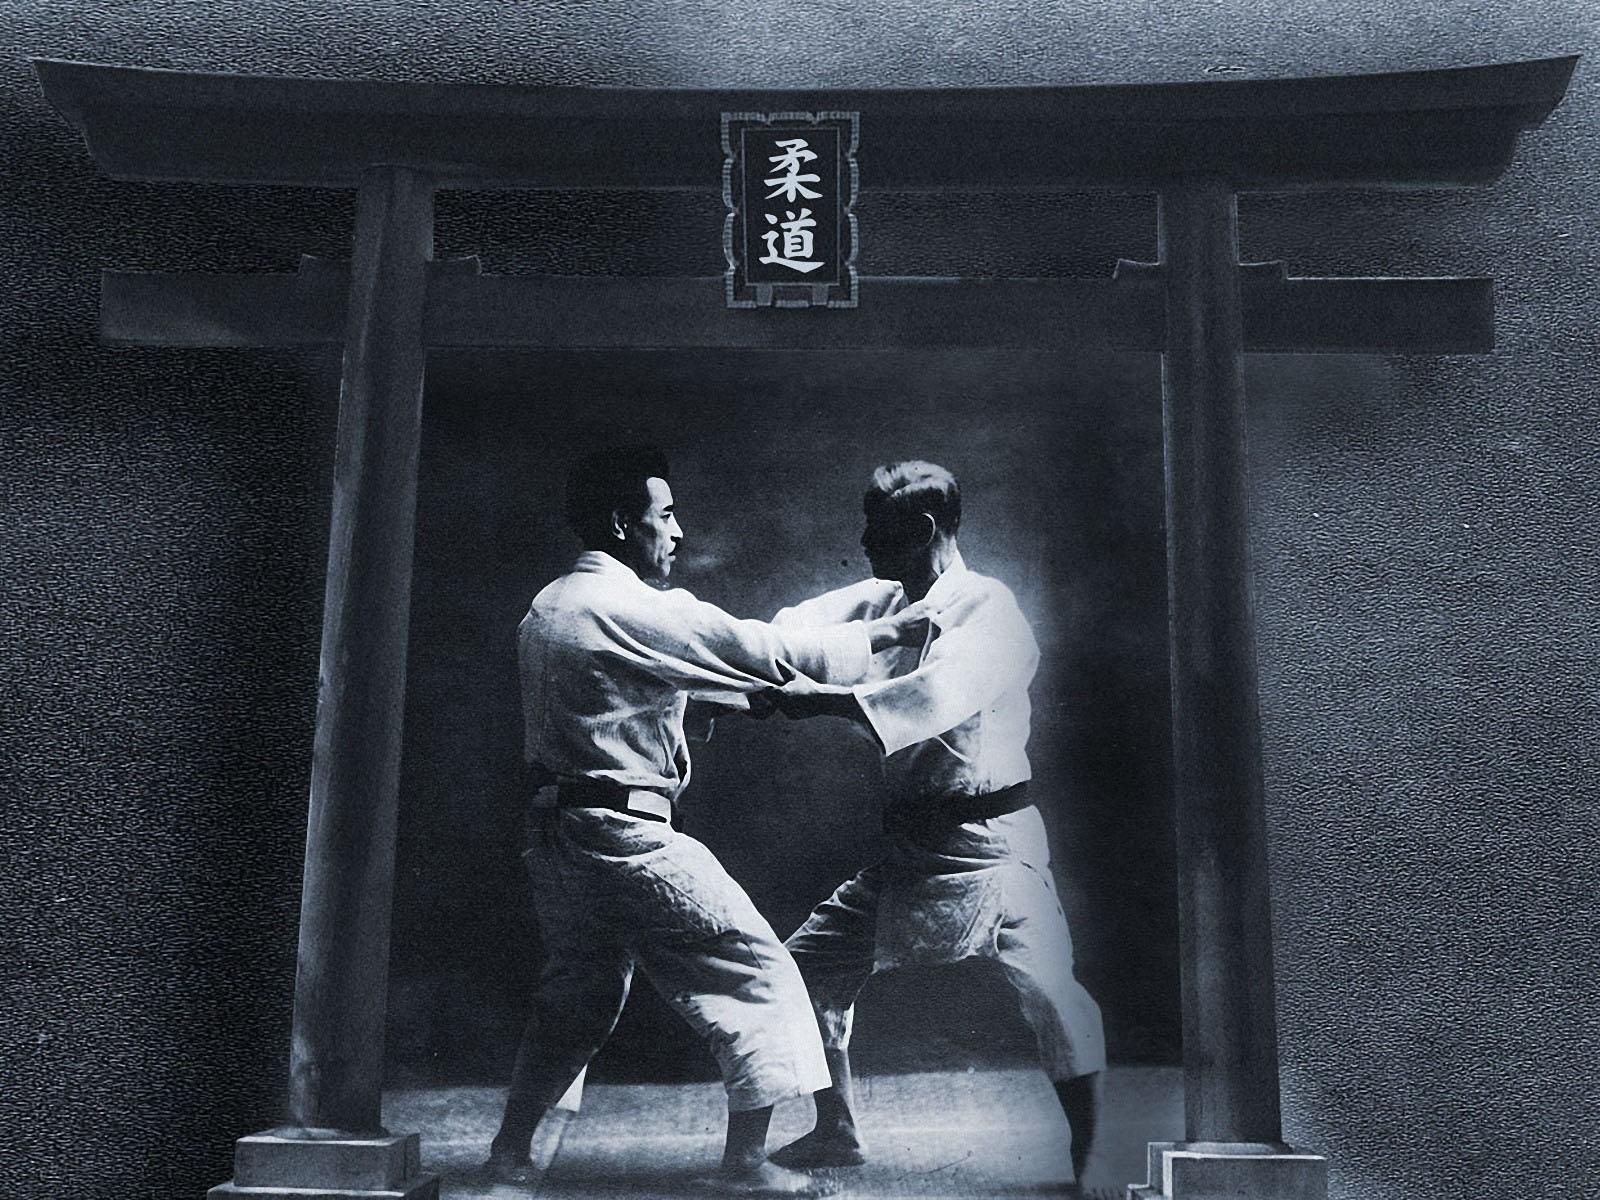 Judo Old WallpapersJudo Wallpapers amp Pictures Download 1600x1200